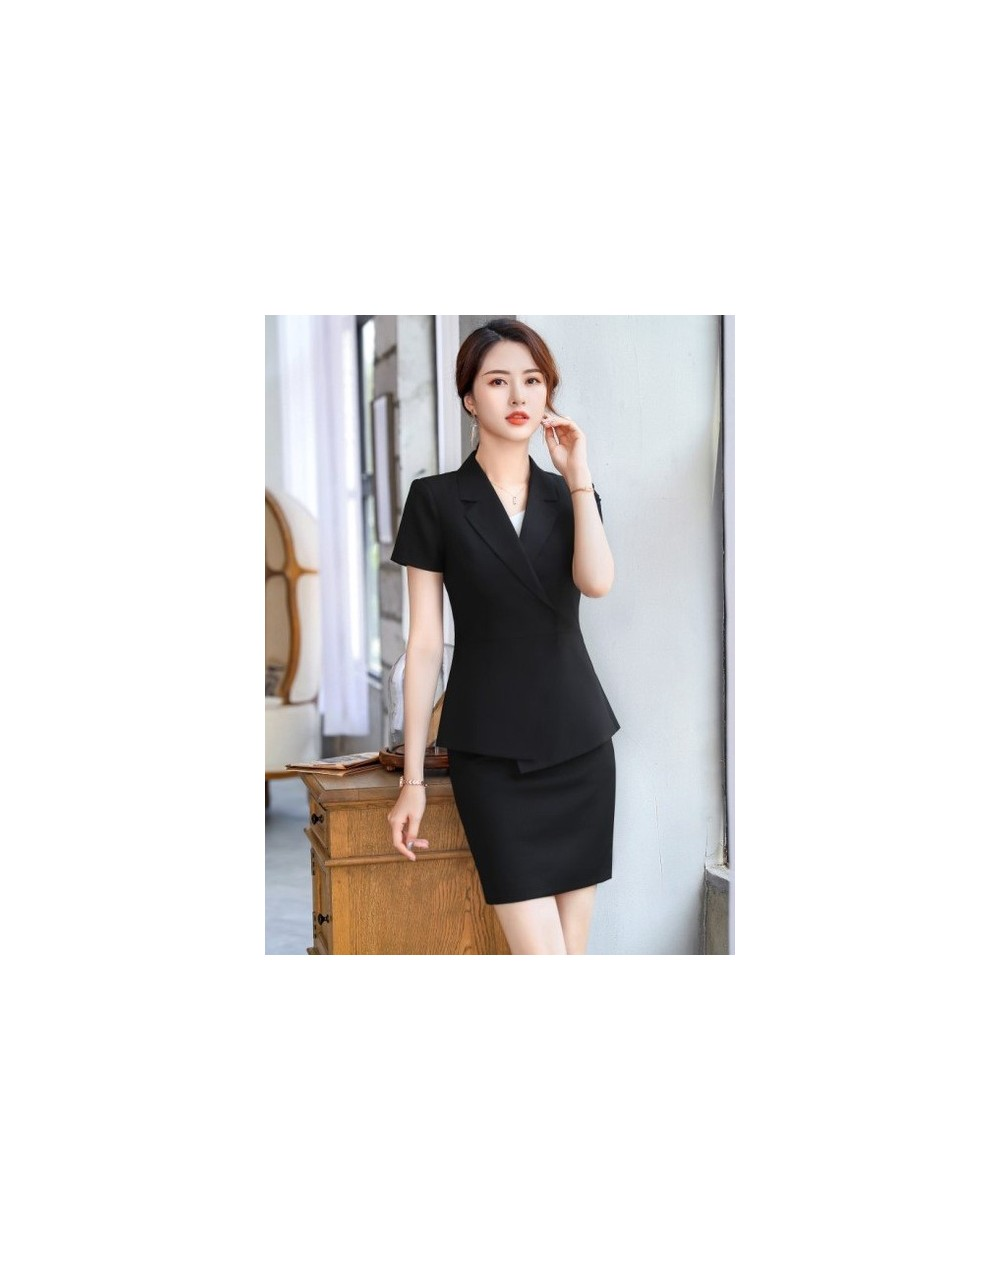 Fashion Elegant women summer skirt suits casual white black temperament short sleeve blazer and skirt office ladies formal s...